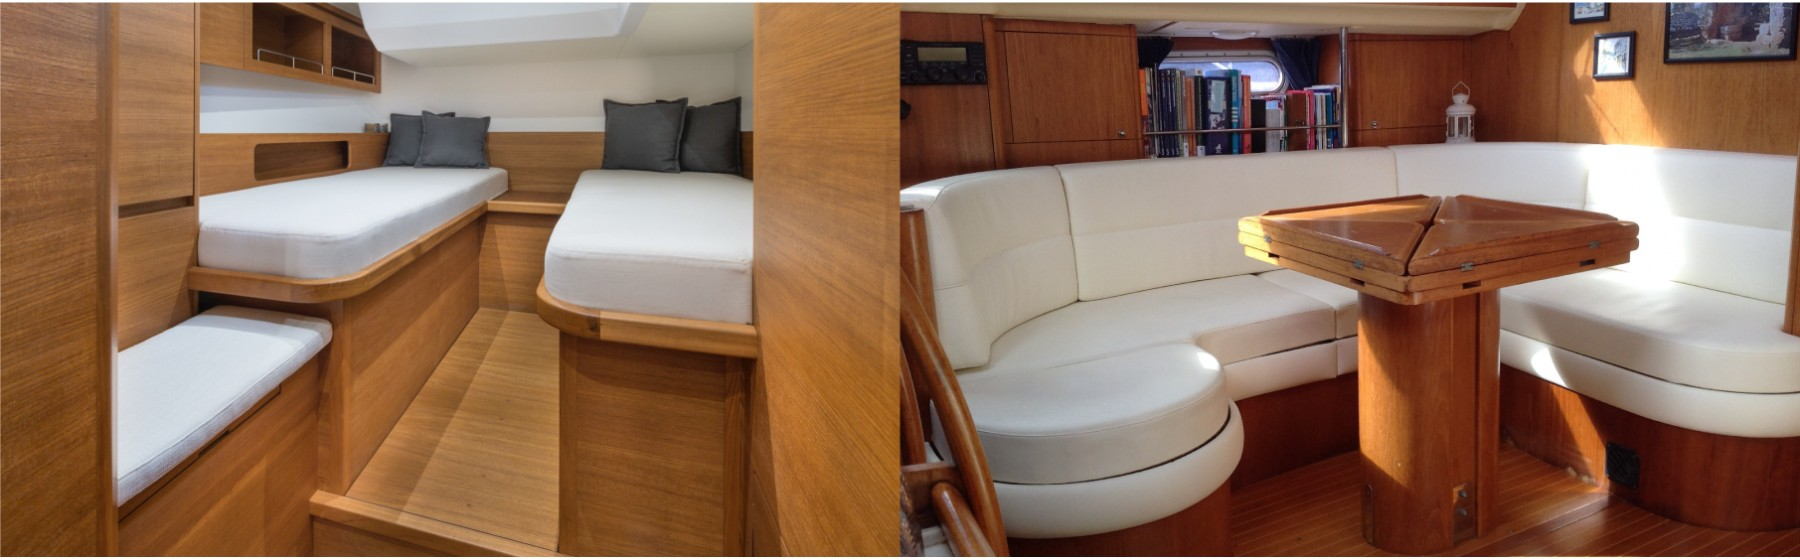 Boat Seats And Mattresses